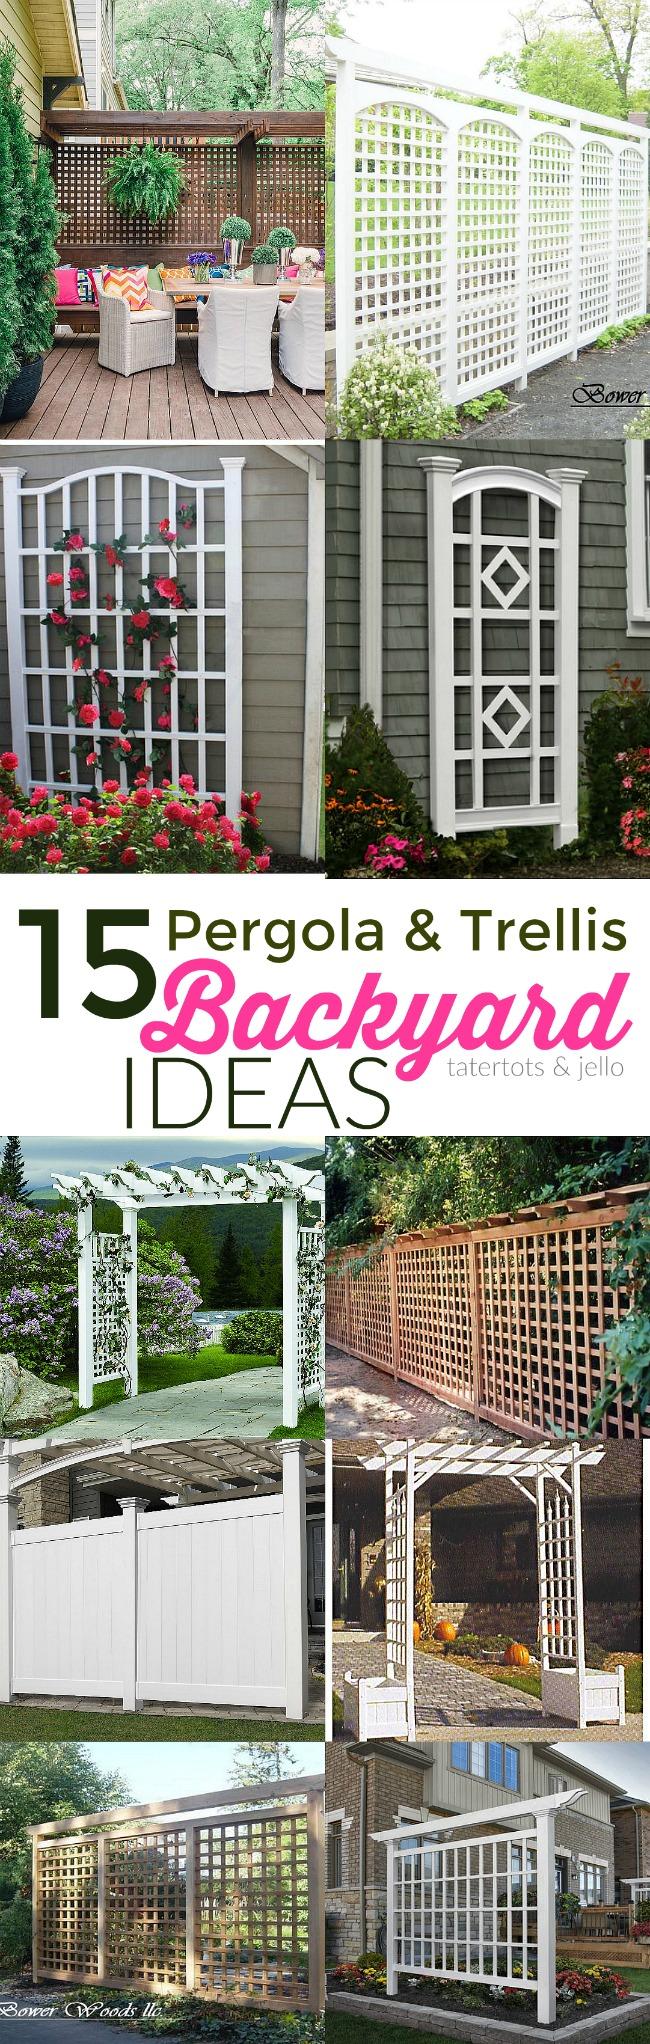 15 trellis and pergola backyard ideas tatertots and jello